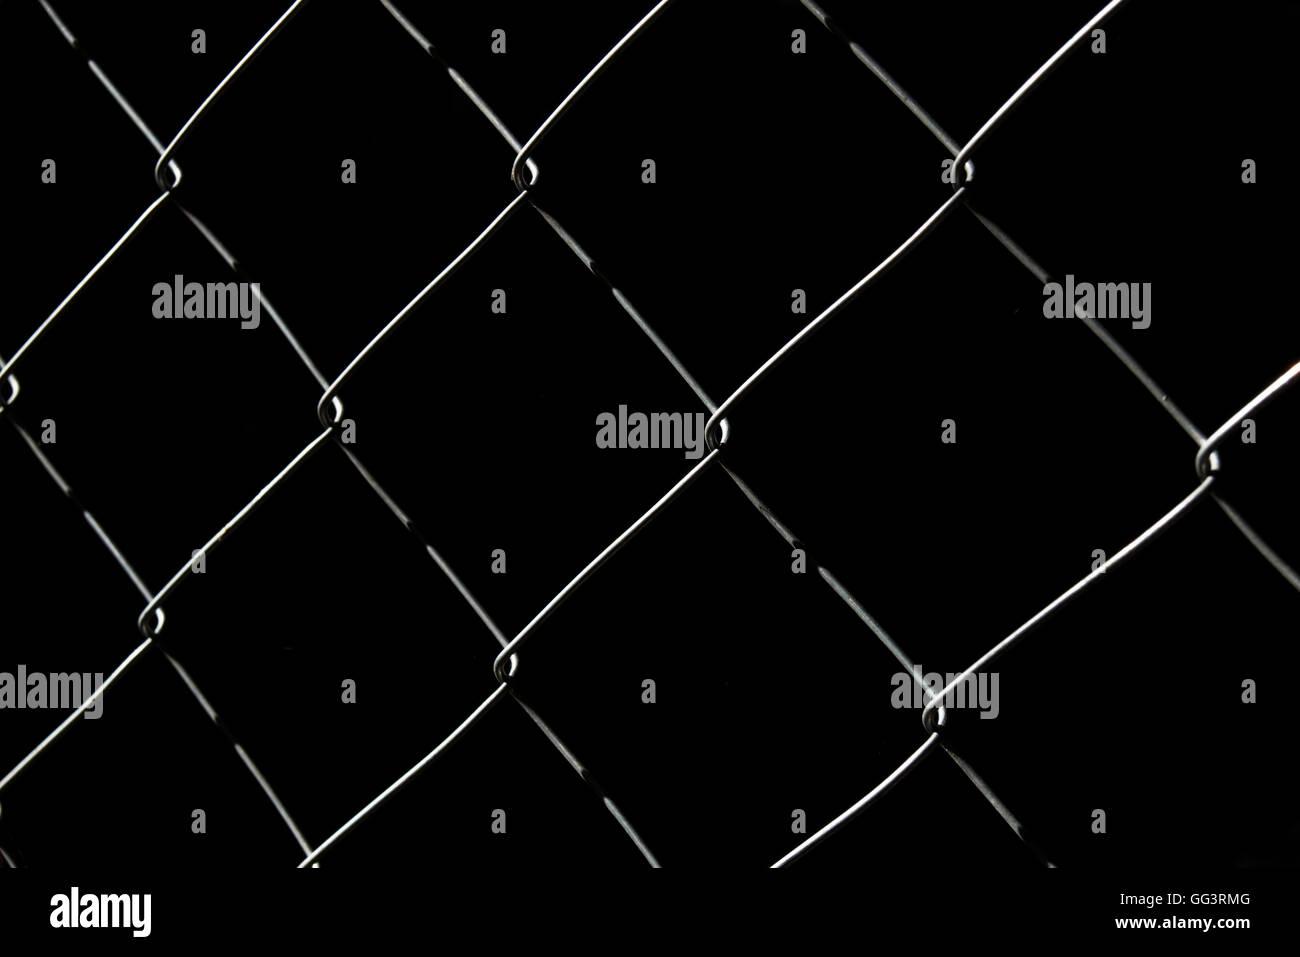 Diamond Mesh Fence Stock Photos & Diamond Mesh Fence Stock Images ...